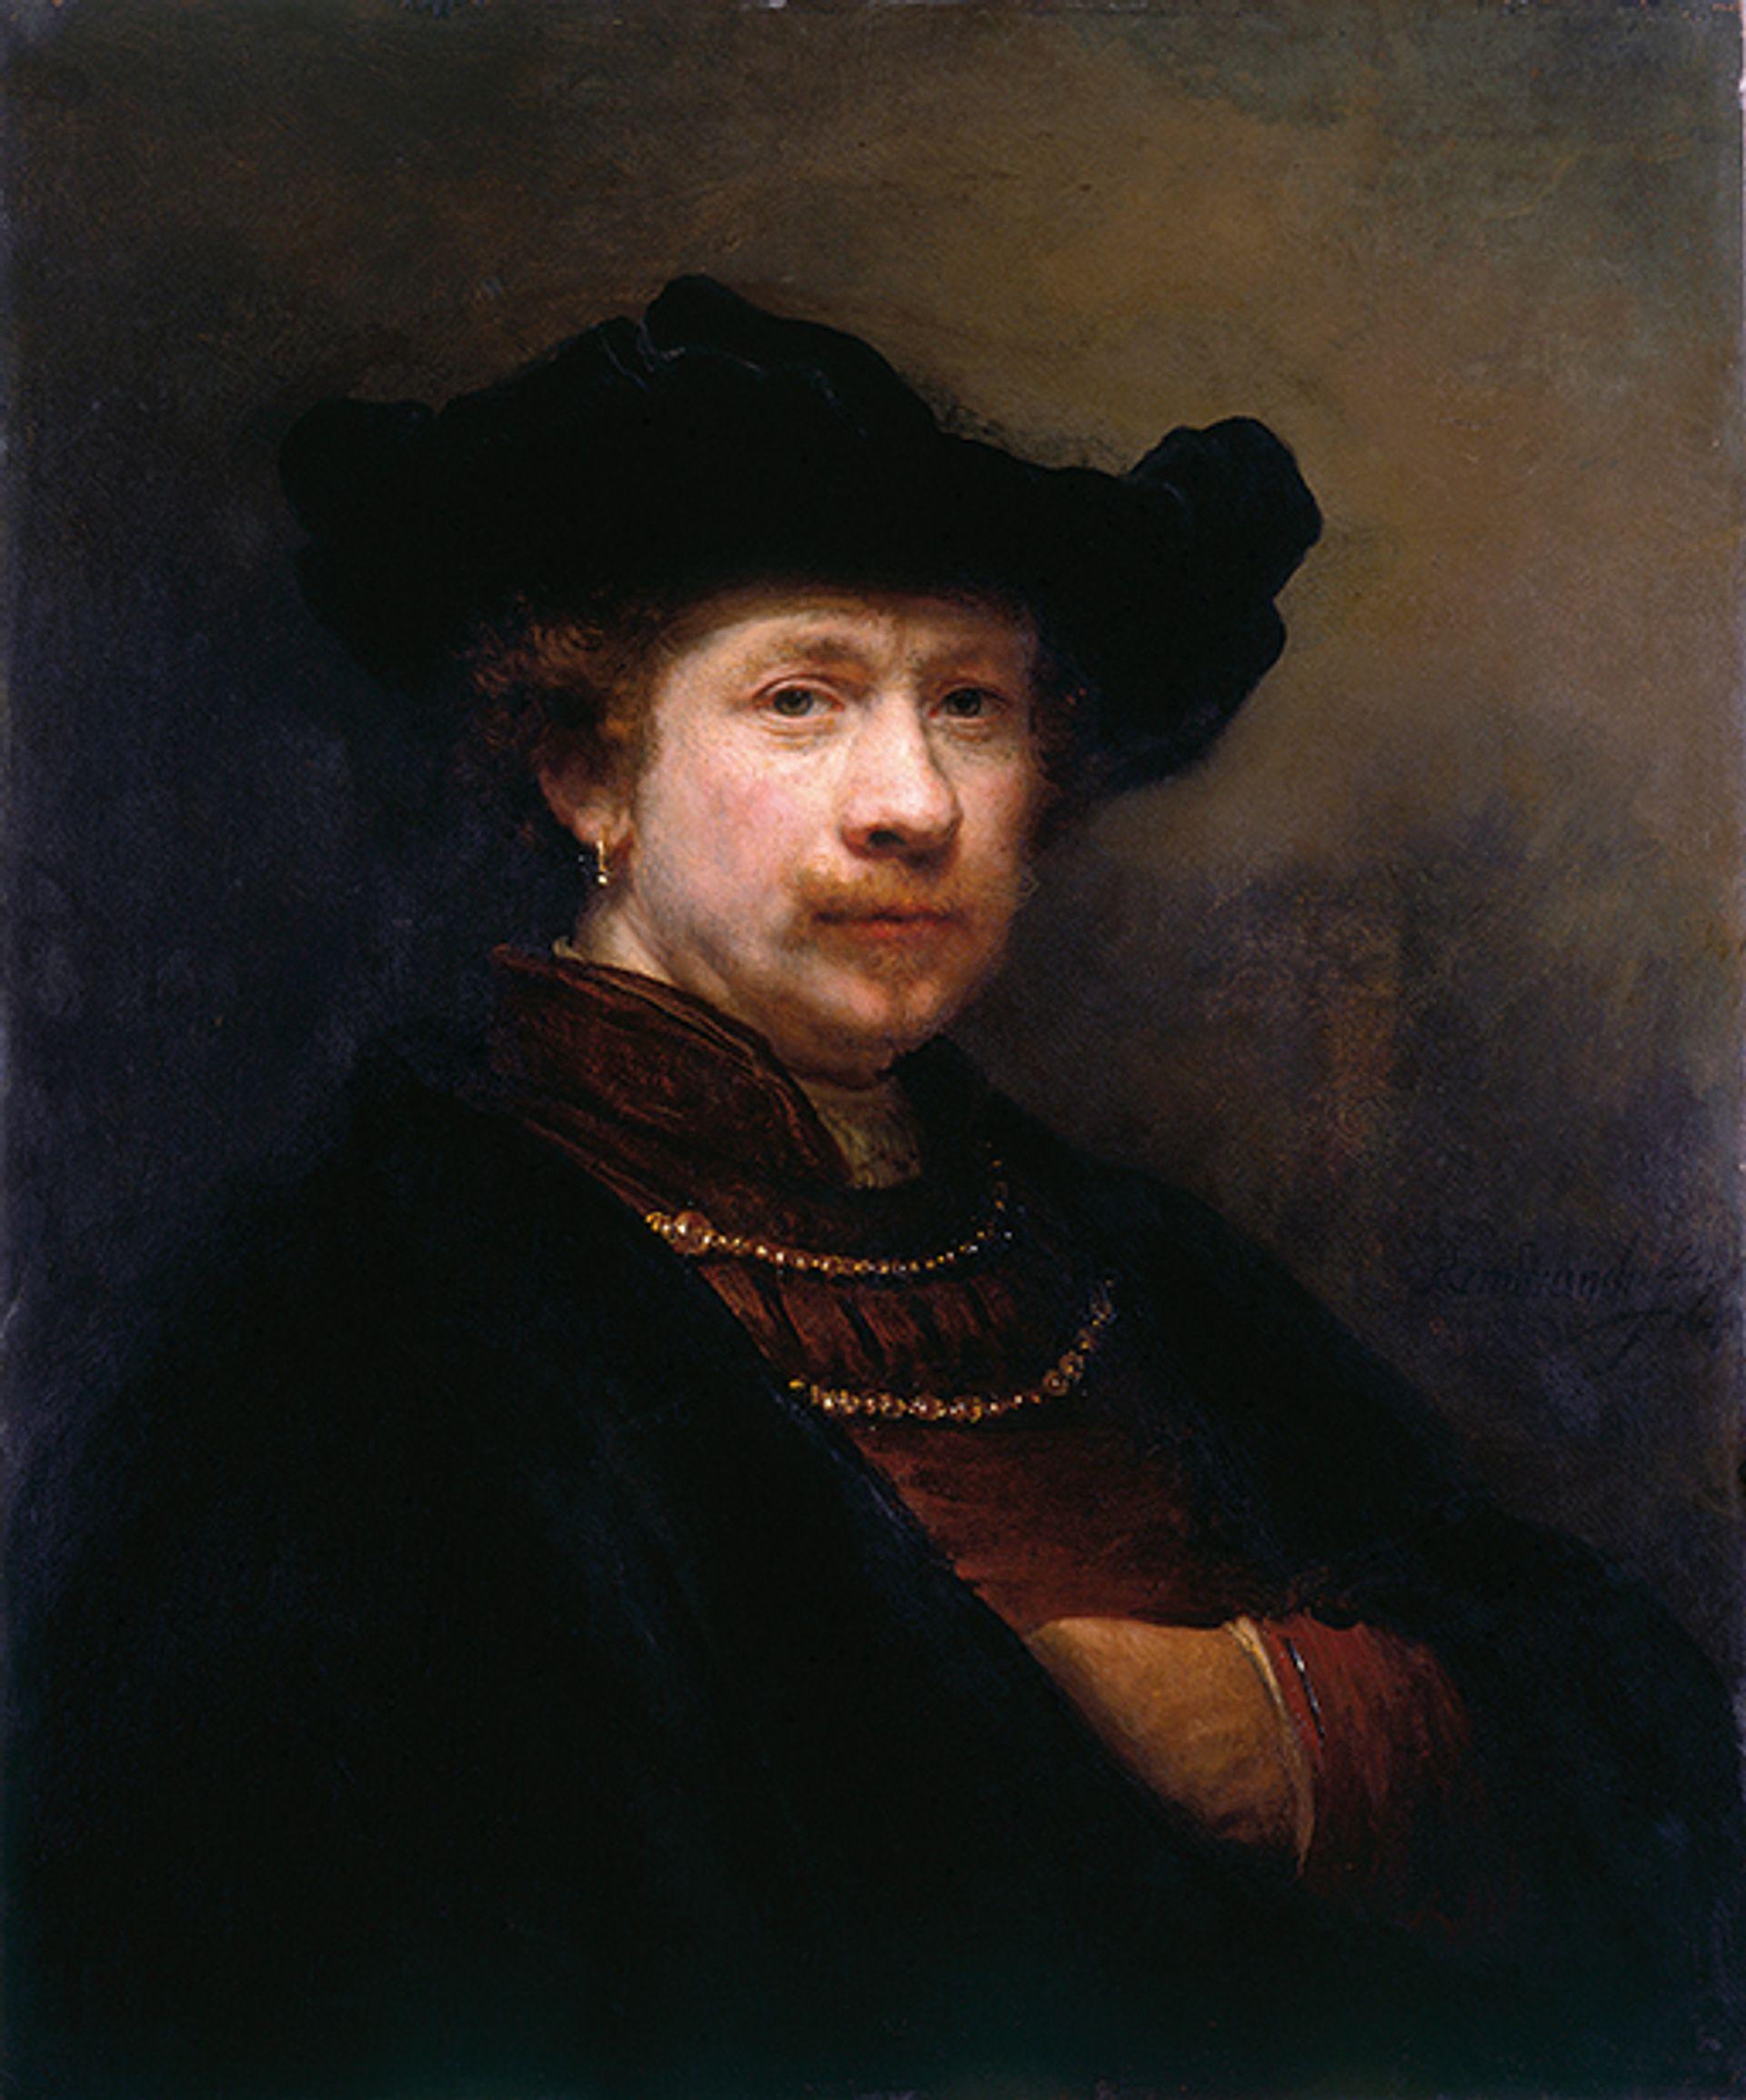 Rembrandt van Rijn's Self-Portrait (1642) © Her Majesty Queen Elizabeth II 2018; courtesy of Royal Collection Trust/Dutch Pictures